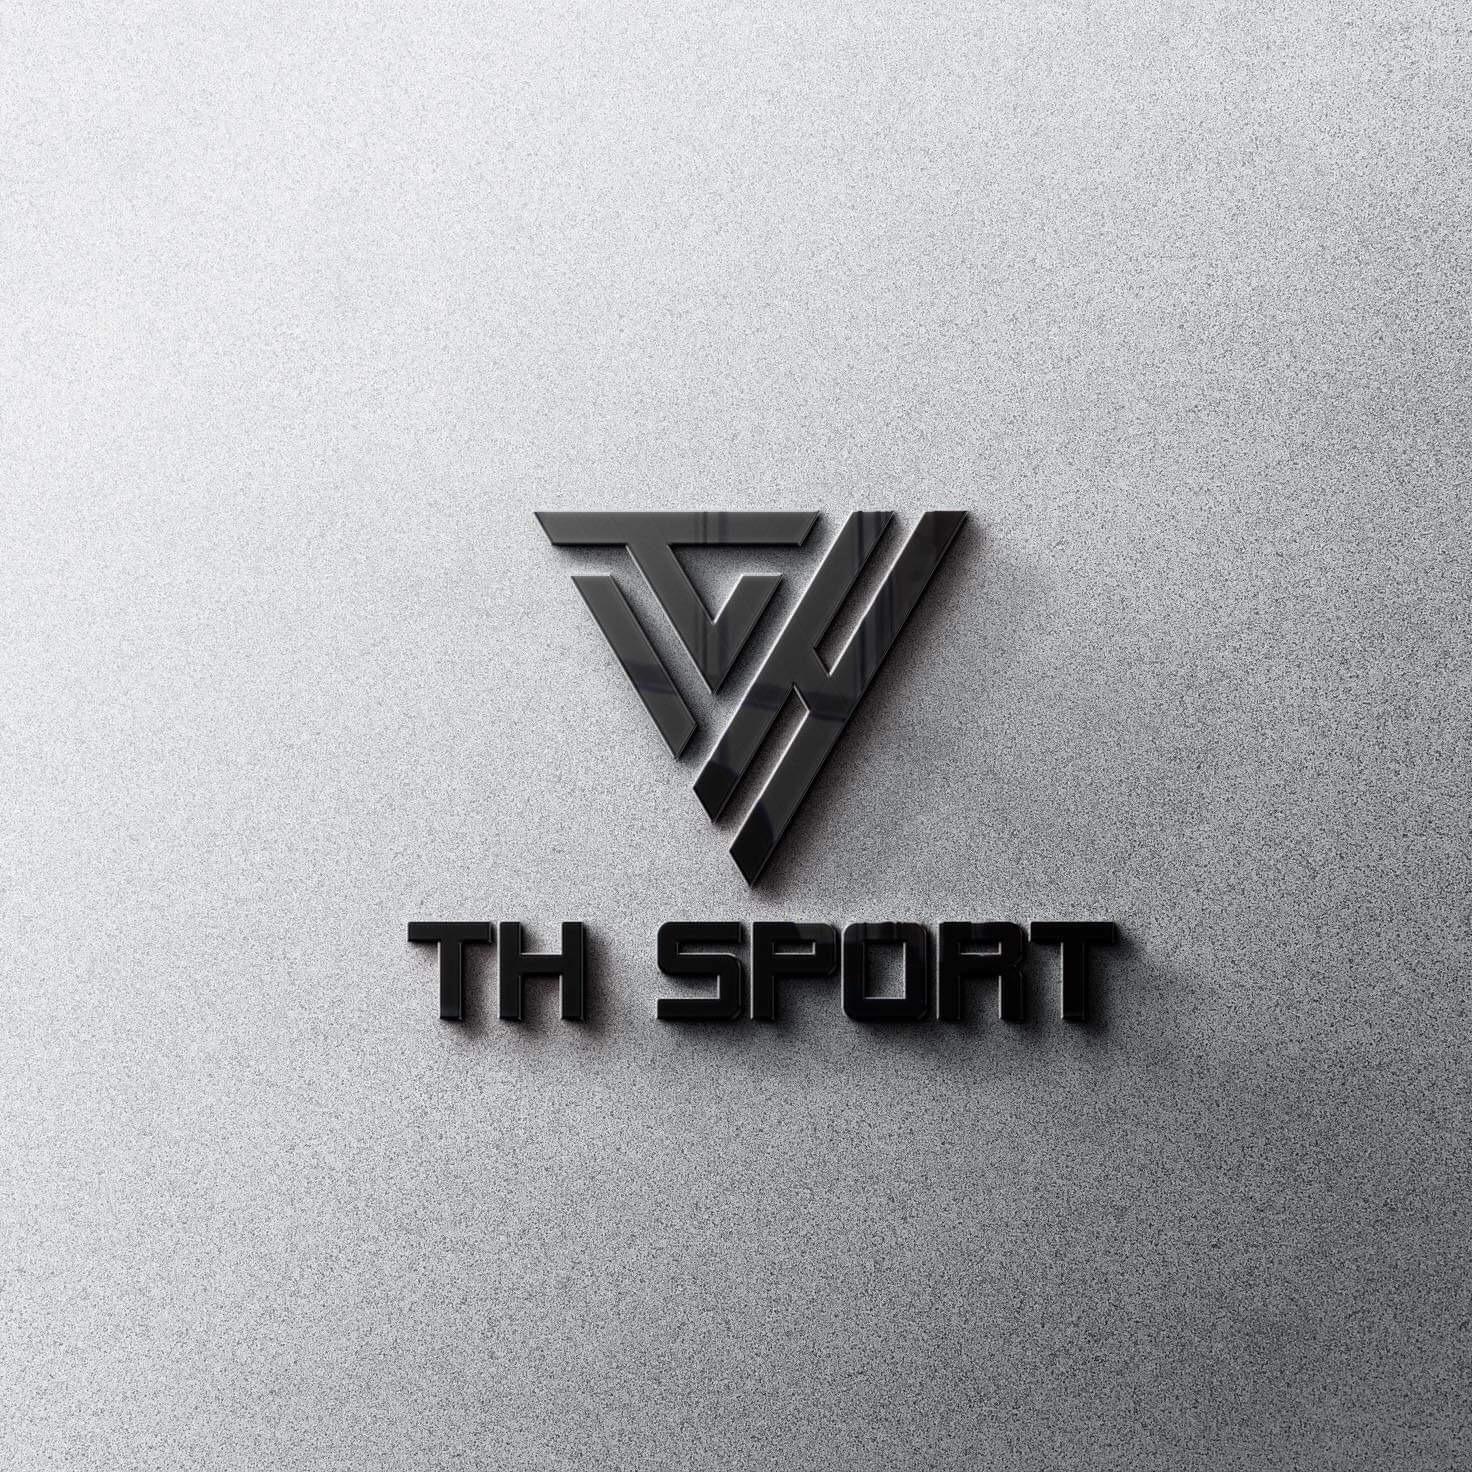 TH SPORT